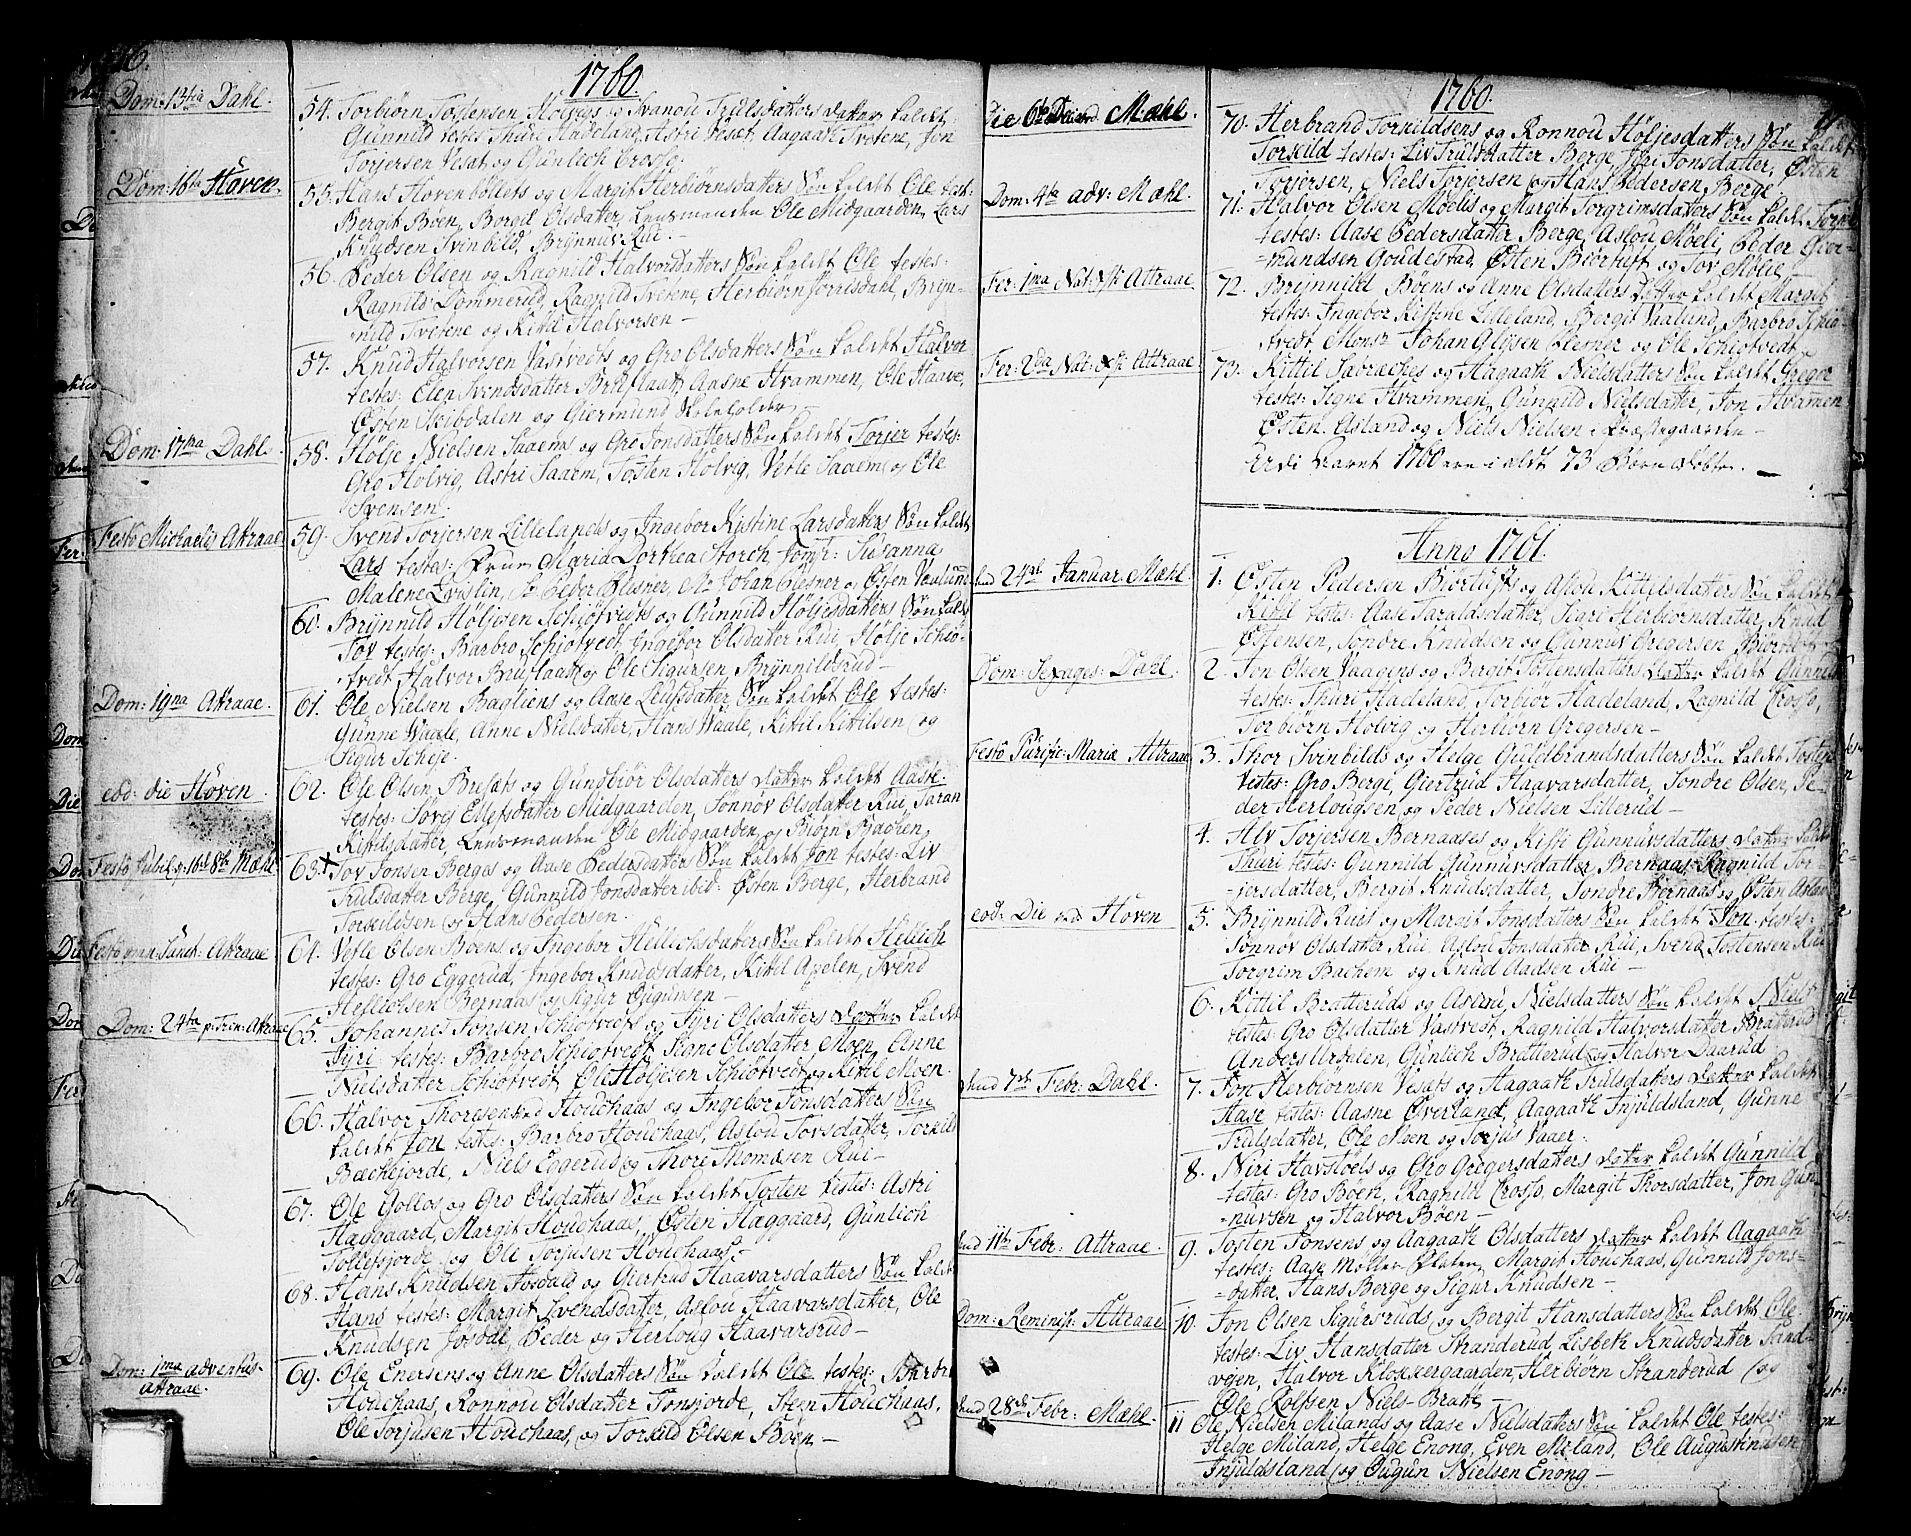 SAKO, Tinn kirkebøker, F/Fa/L0002: Ministerialbok nr. I 2, 1757-1810, s. 16-17